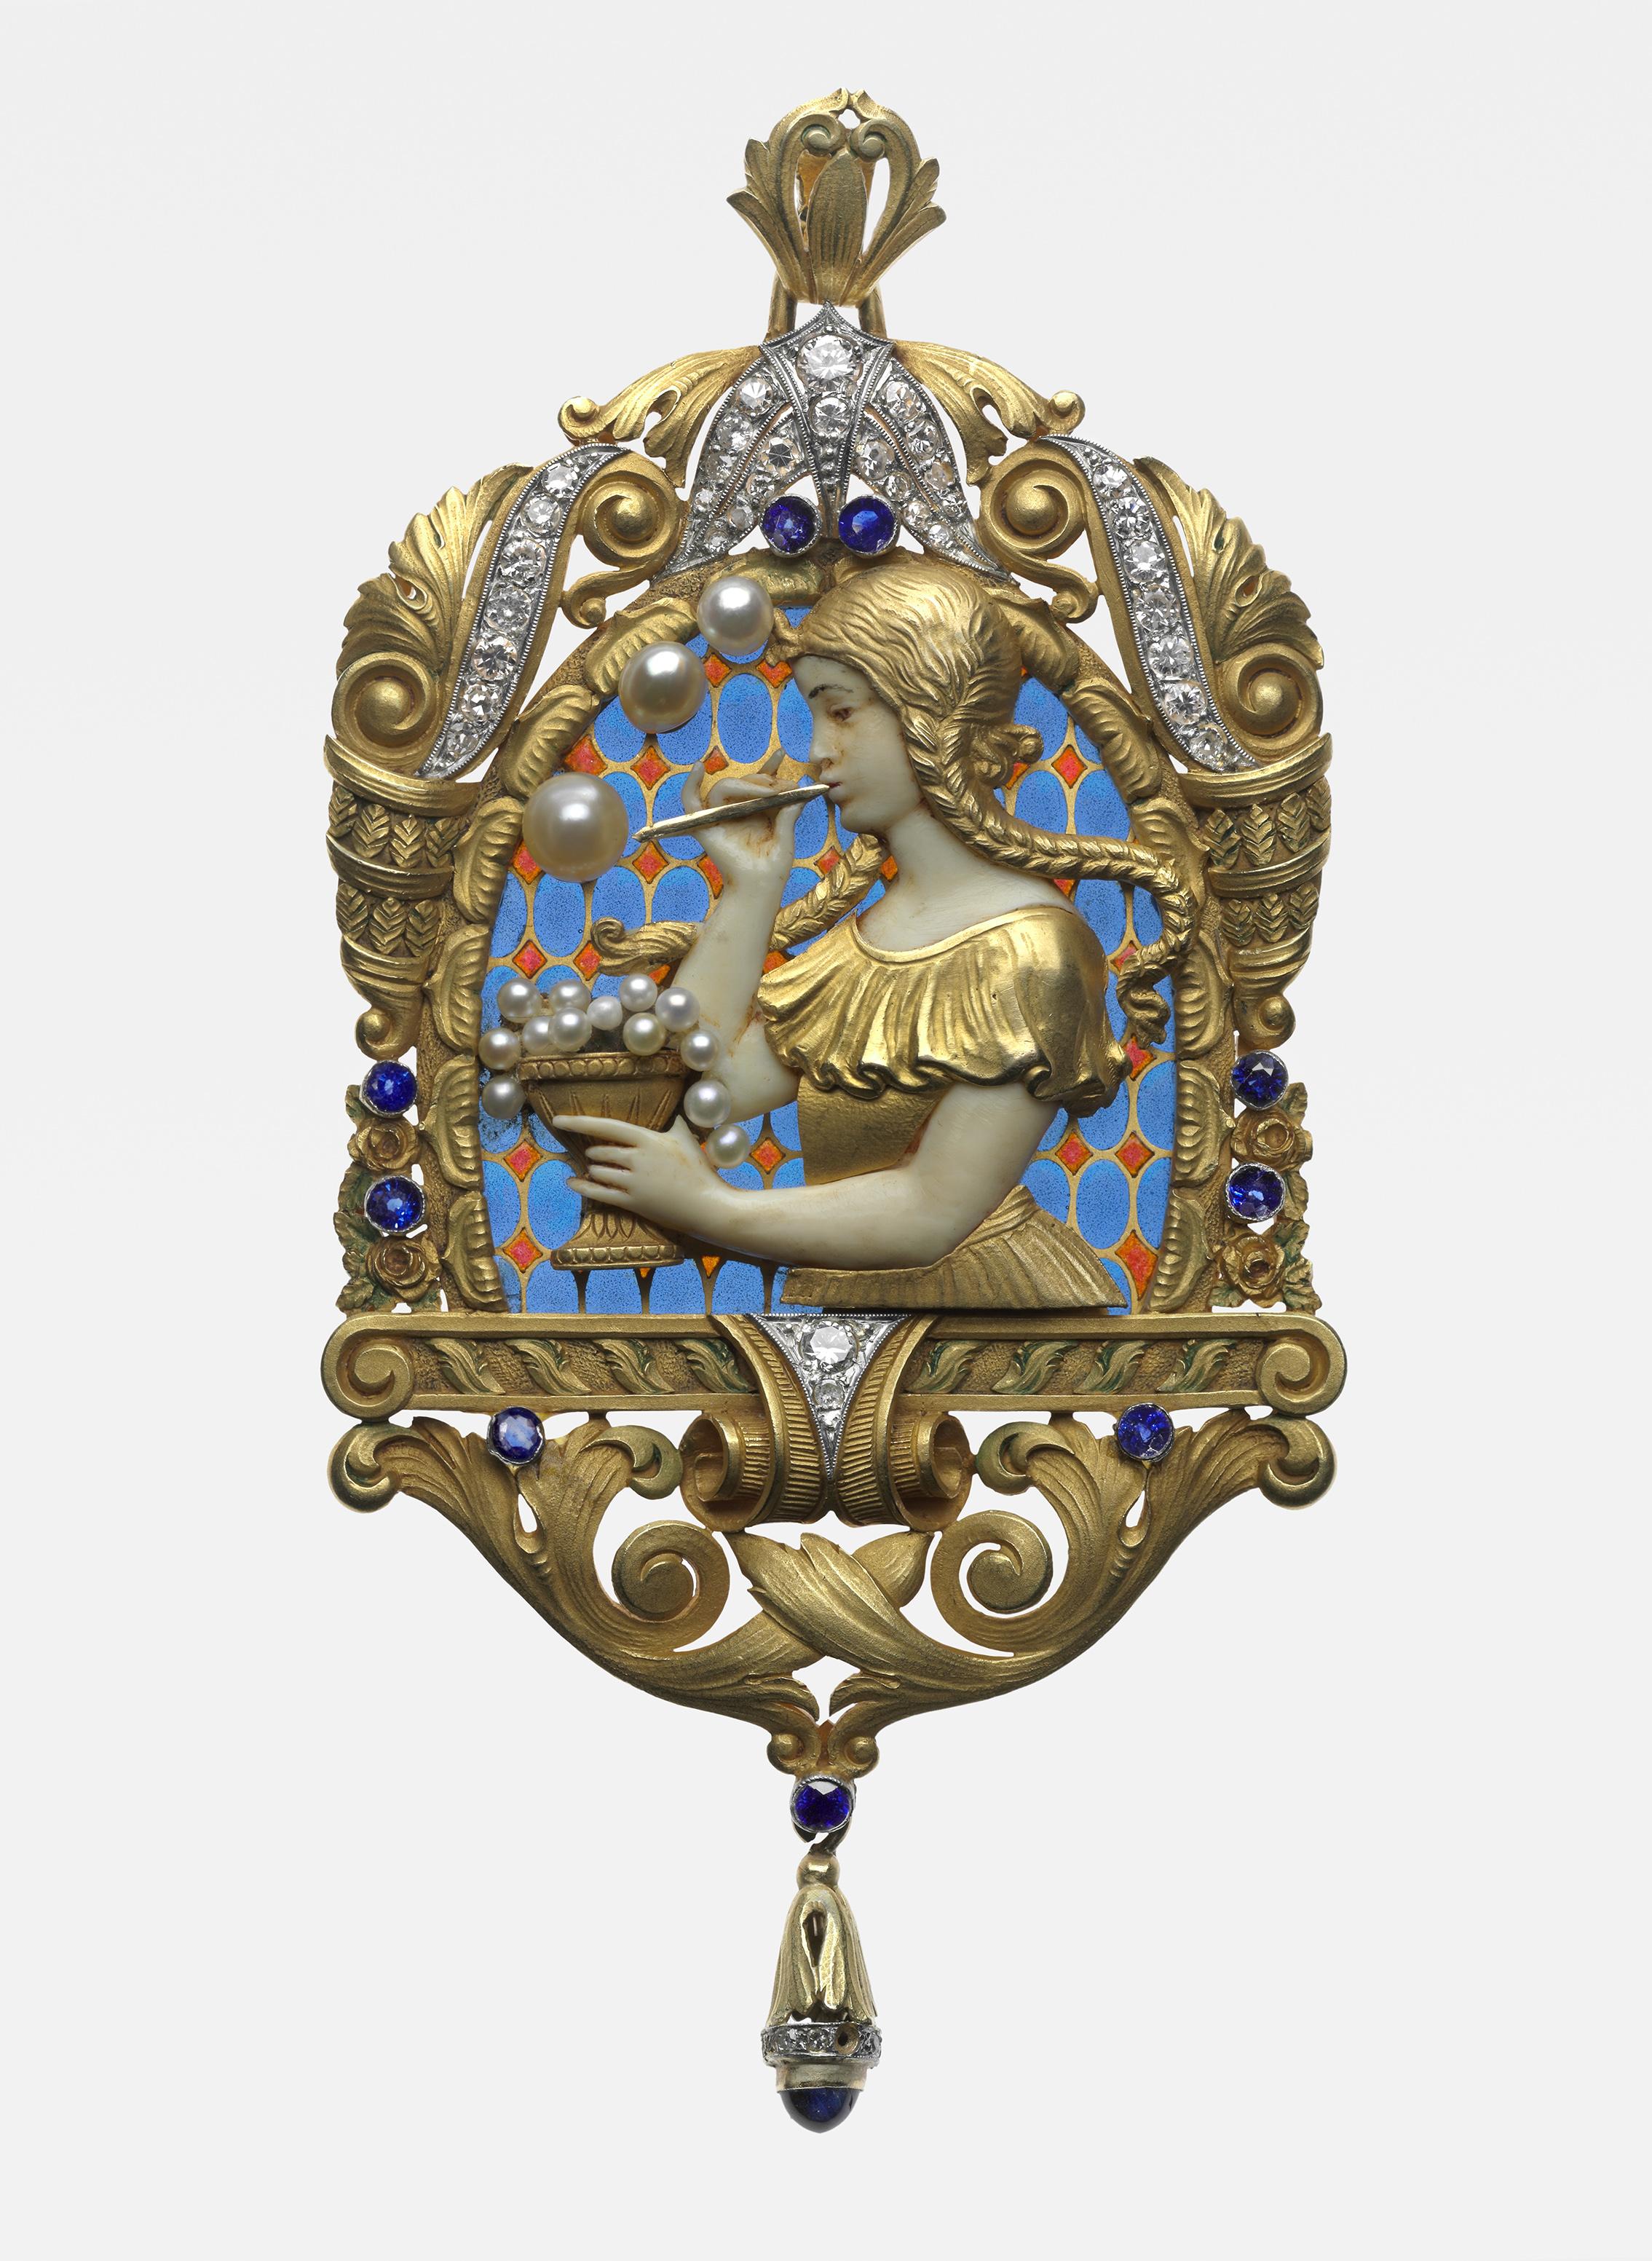 10d571d4d3b This Antique Jewelry Retrospective Proves Fashion Always Makes a ...